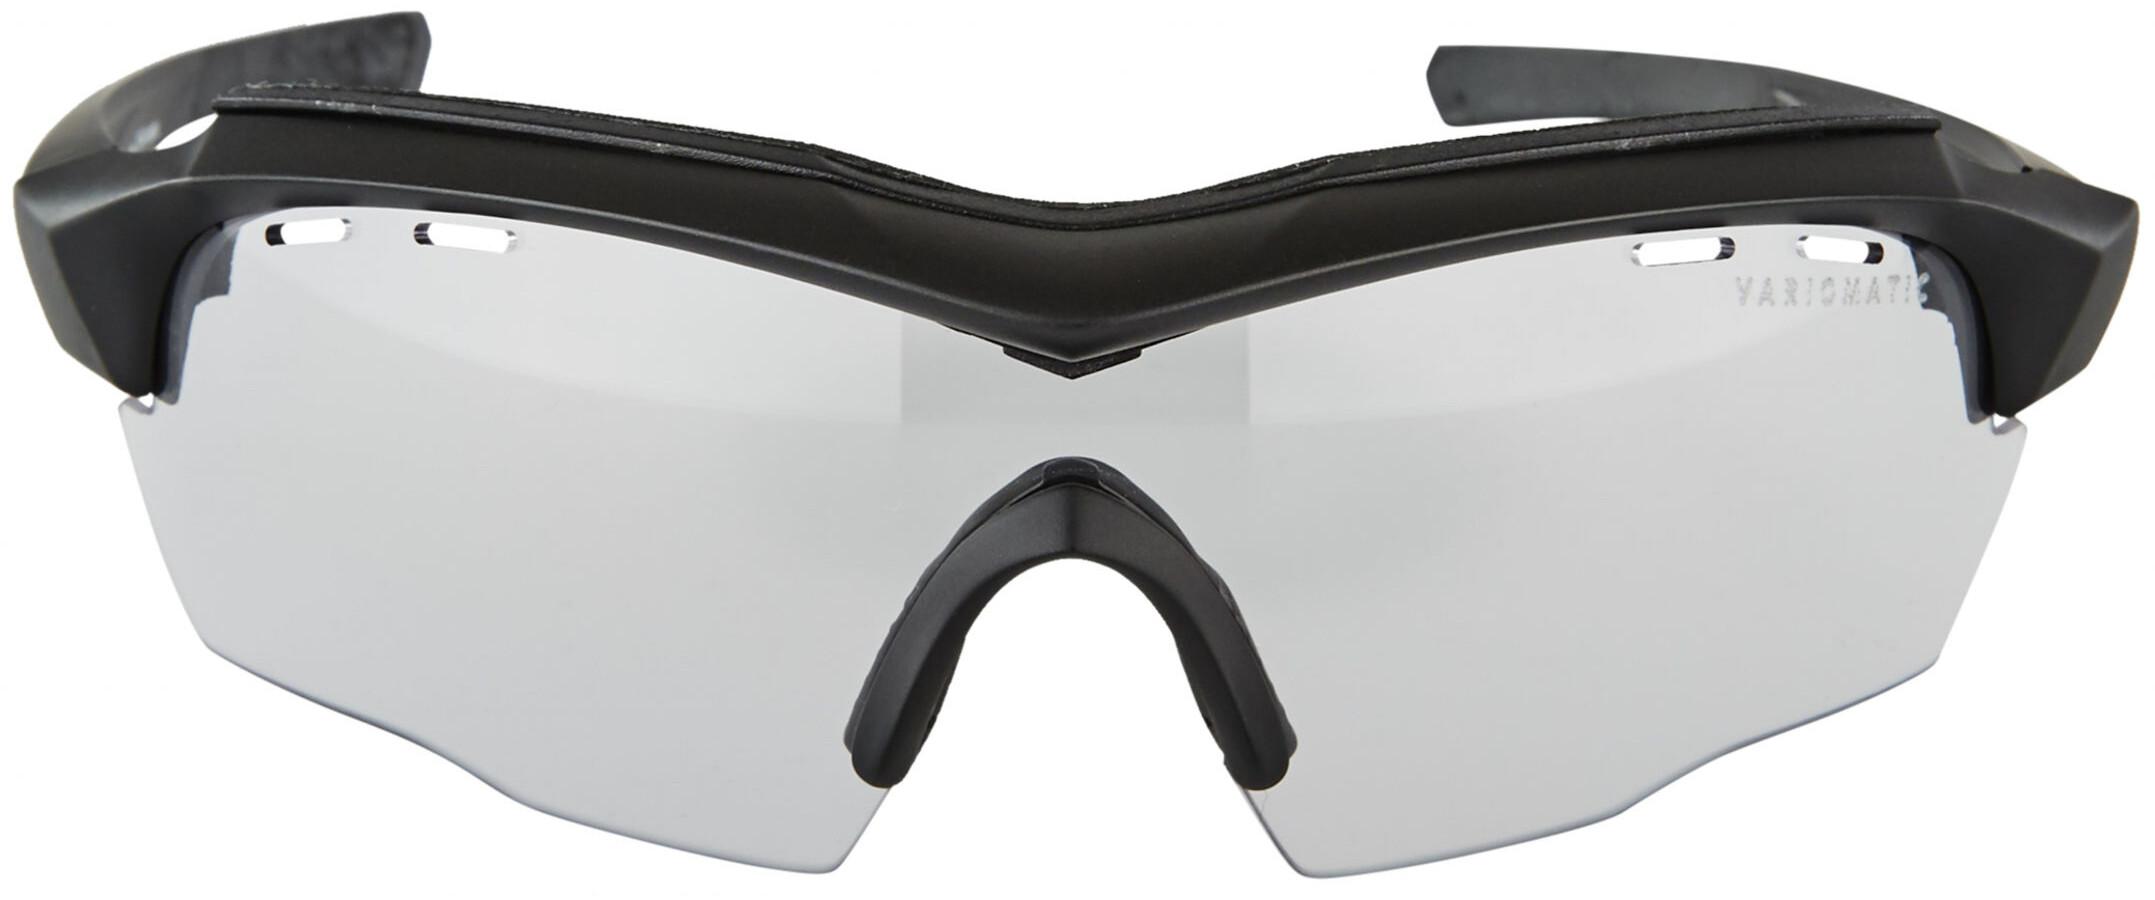 94bd45dad8c5 UVEX sportstyle 104 v Bike Glasses black at Bikester.co.uk